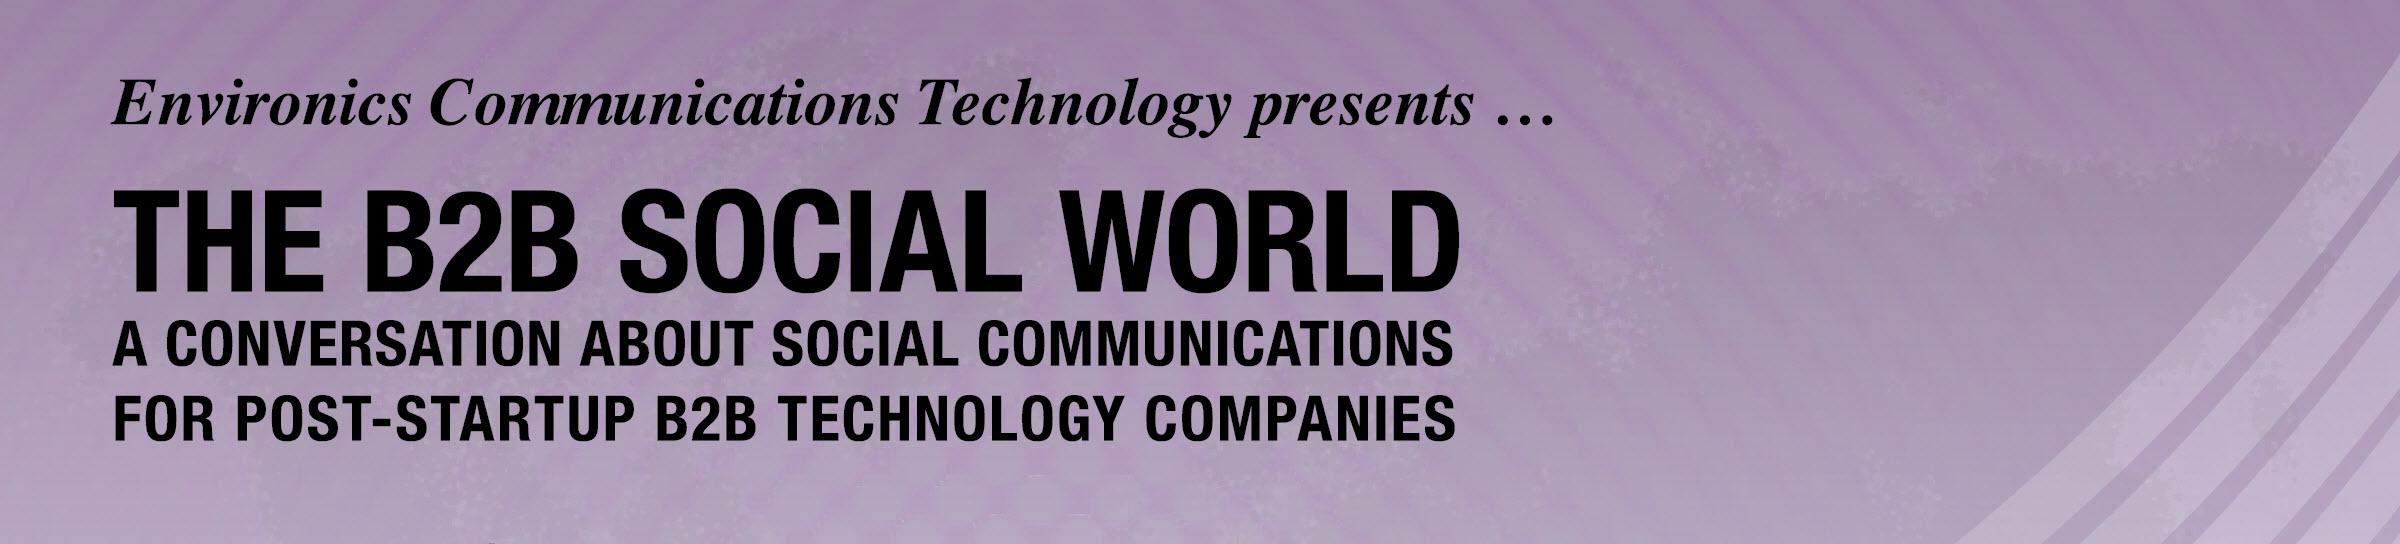 Environics Communications presents The B2B Social World